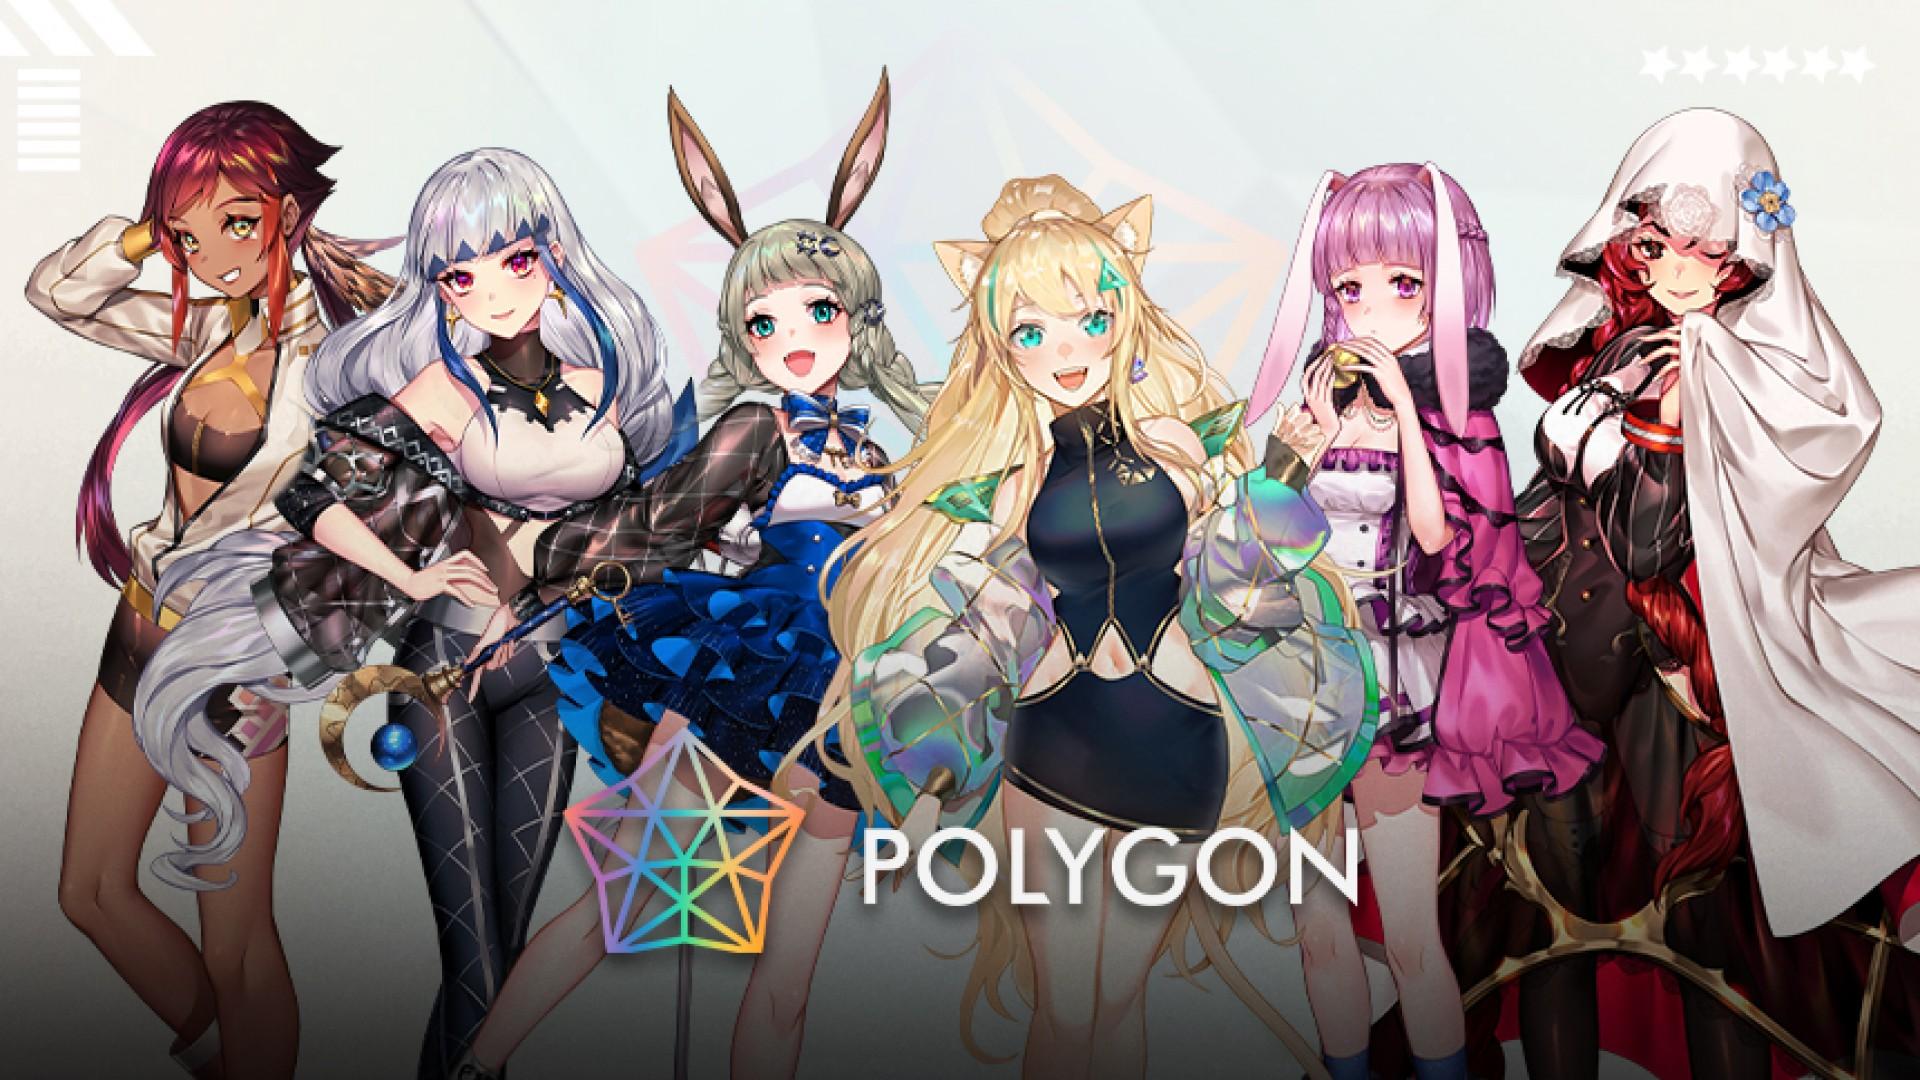 Polygon Project